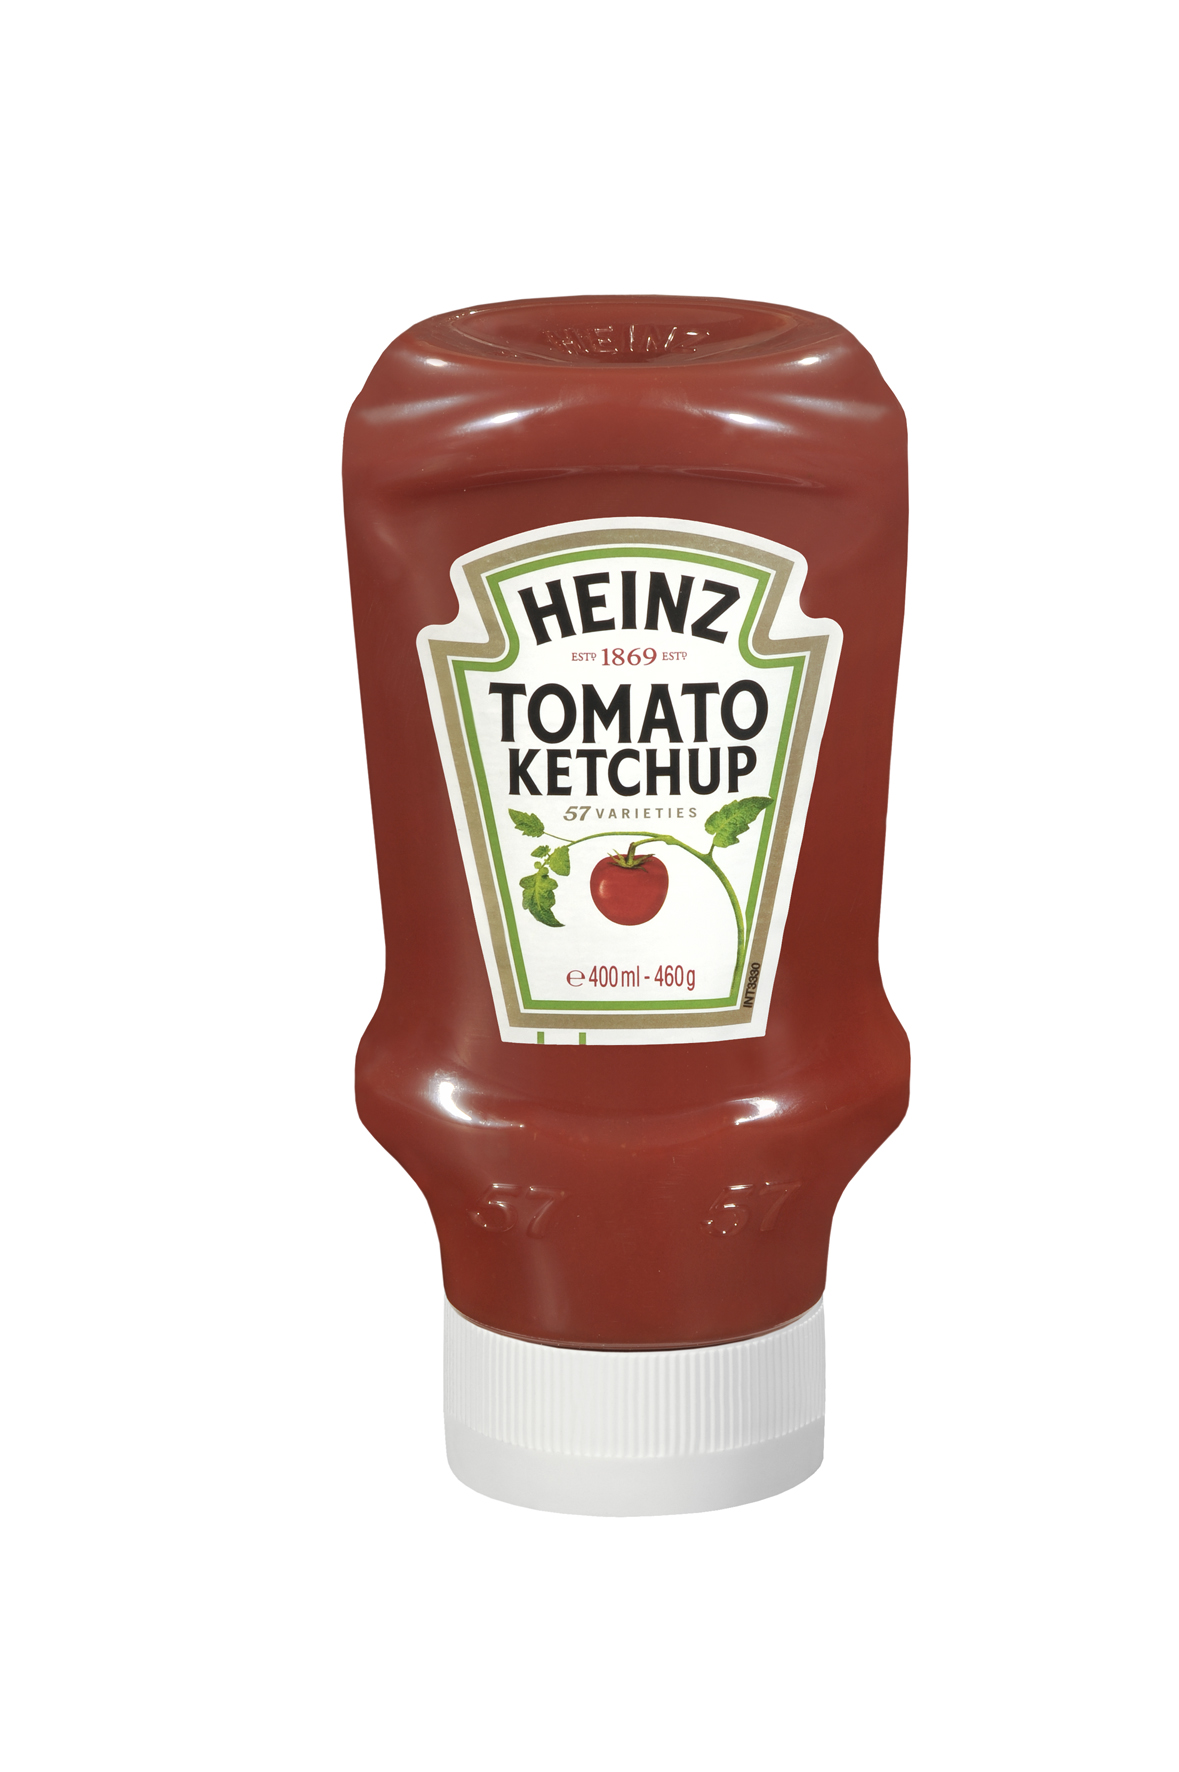 Heinz Tomato Ketchup 460g Top Down image